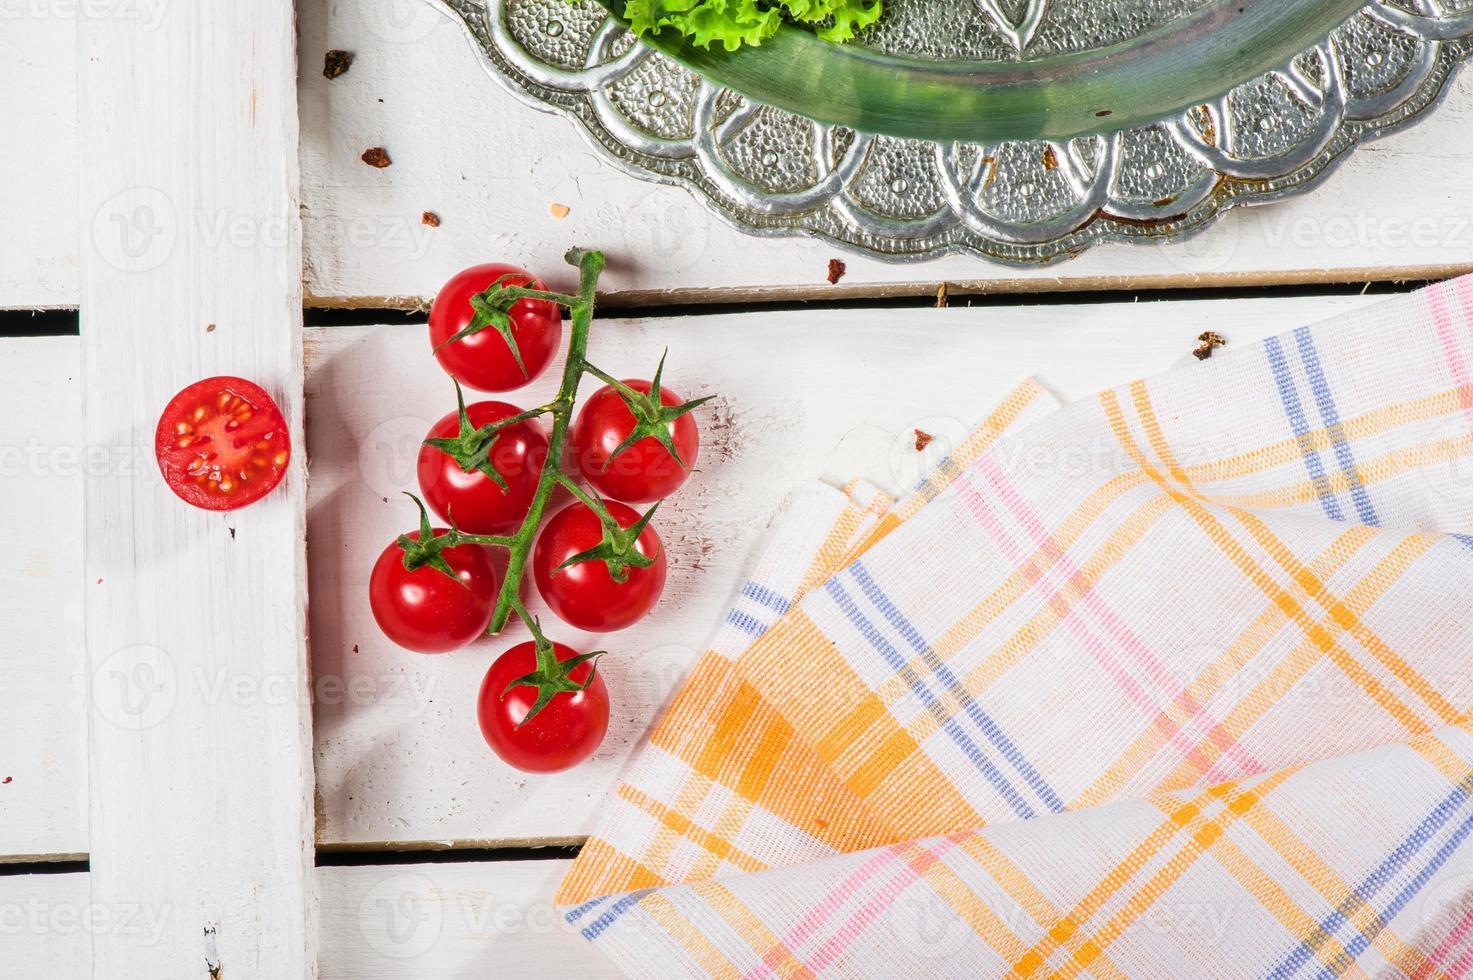 ramita de tomate foto